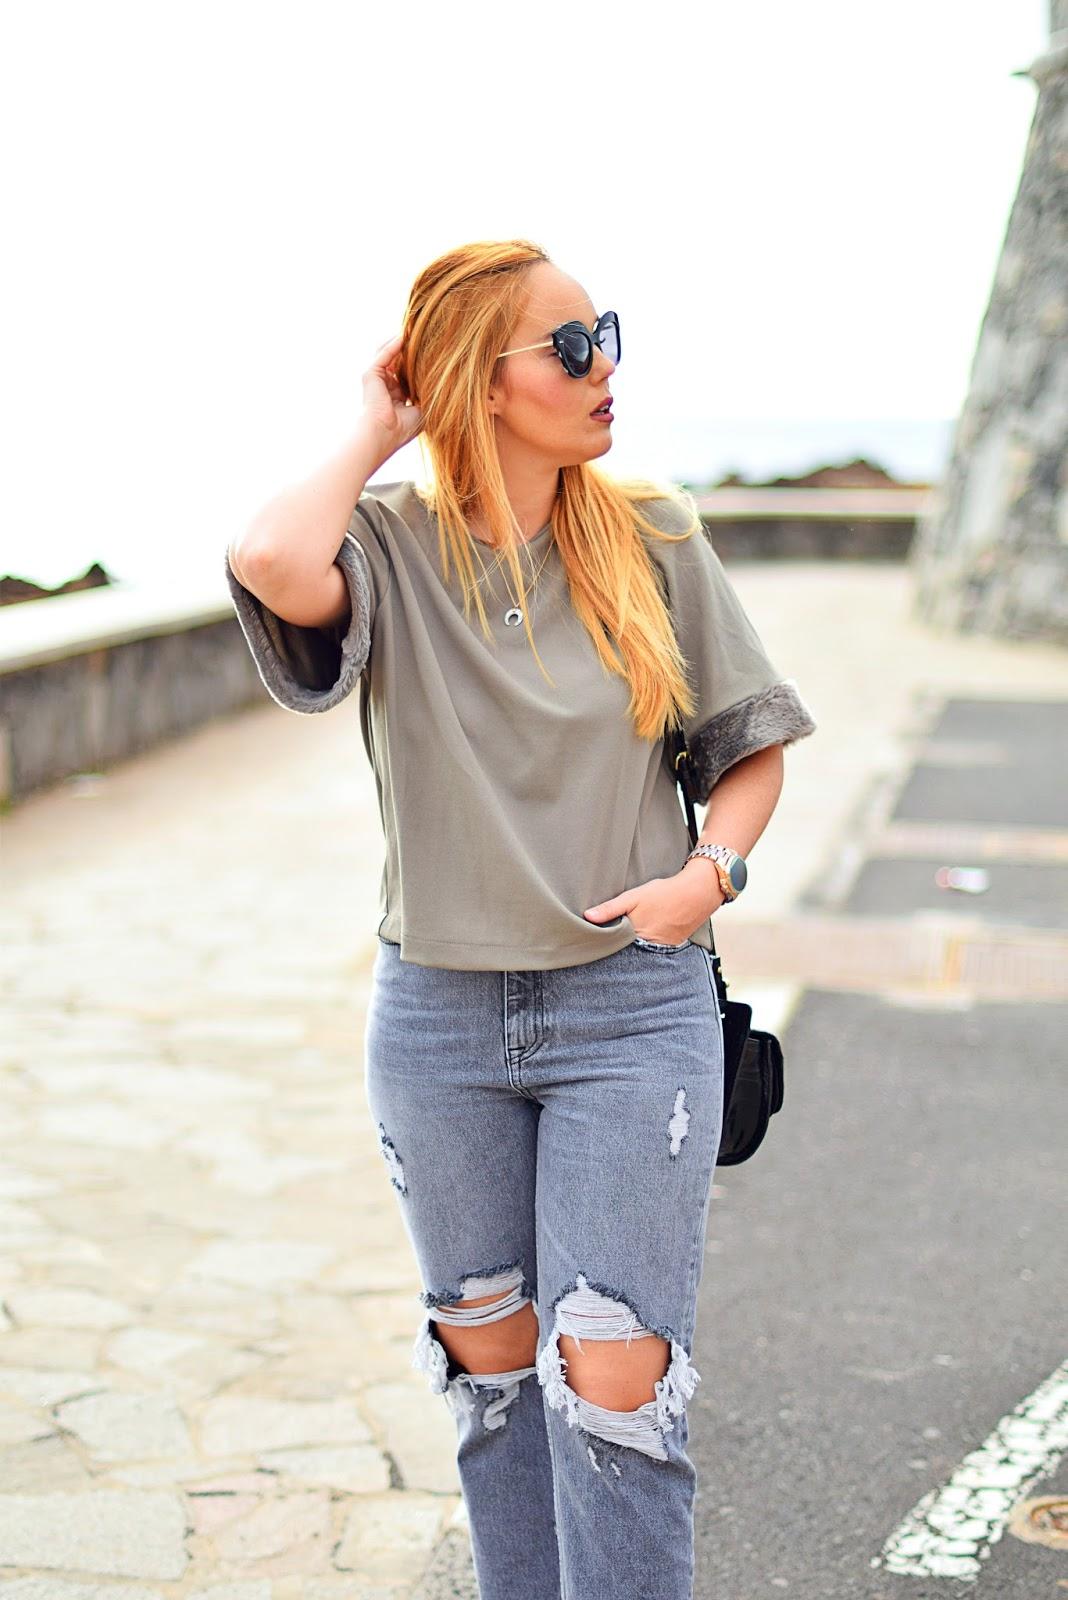 nery hdez, ripped jeans, inface, opticalh , collar de cuerno, look de diario